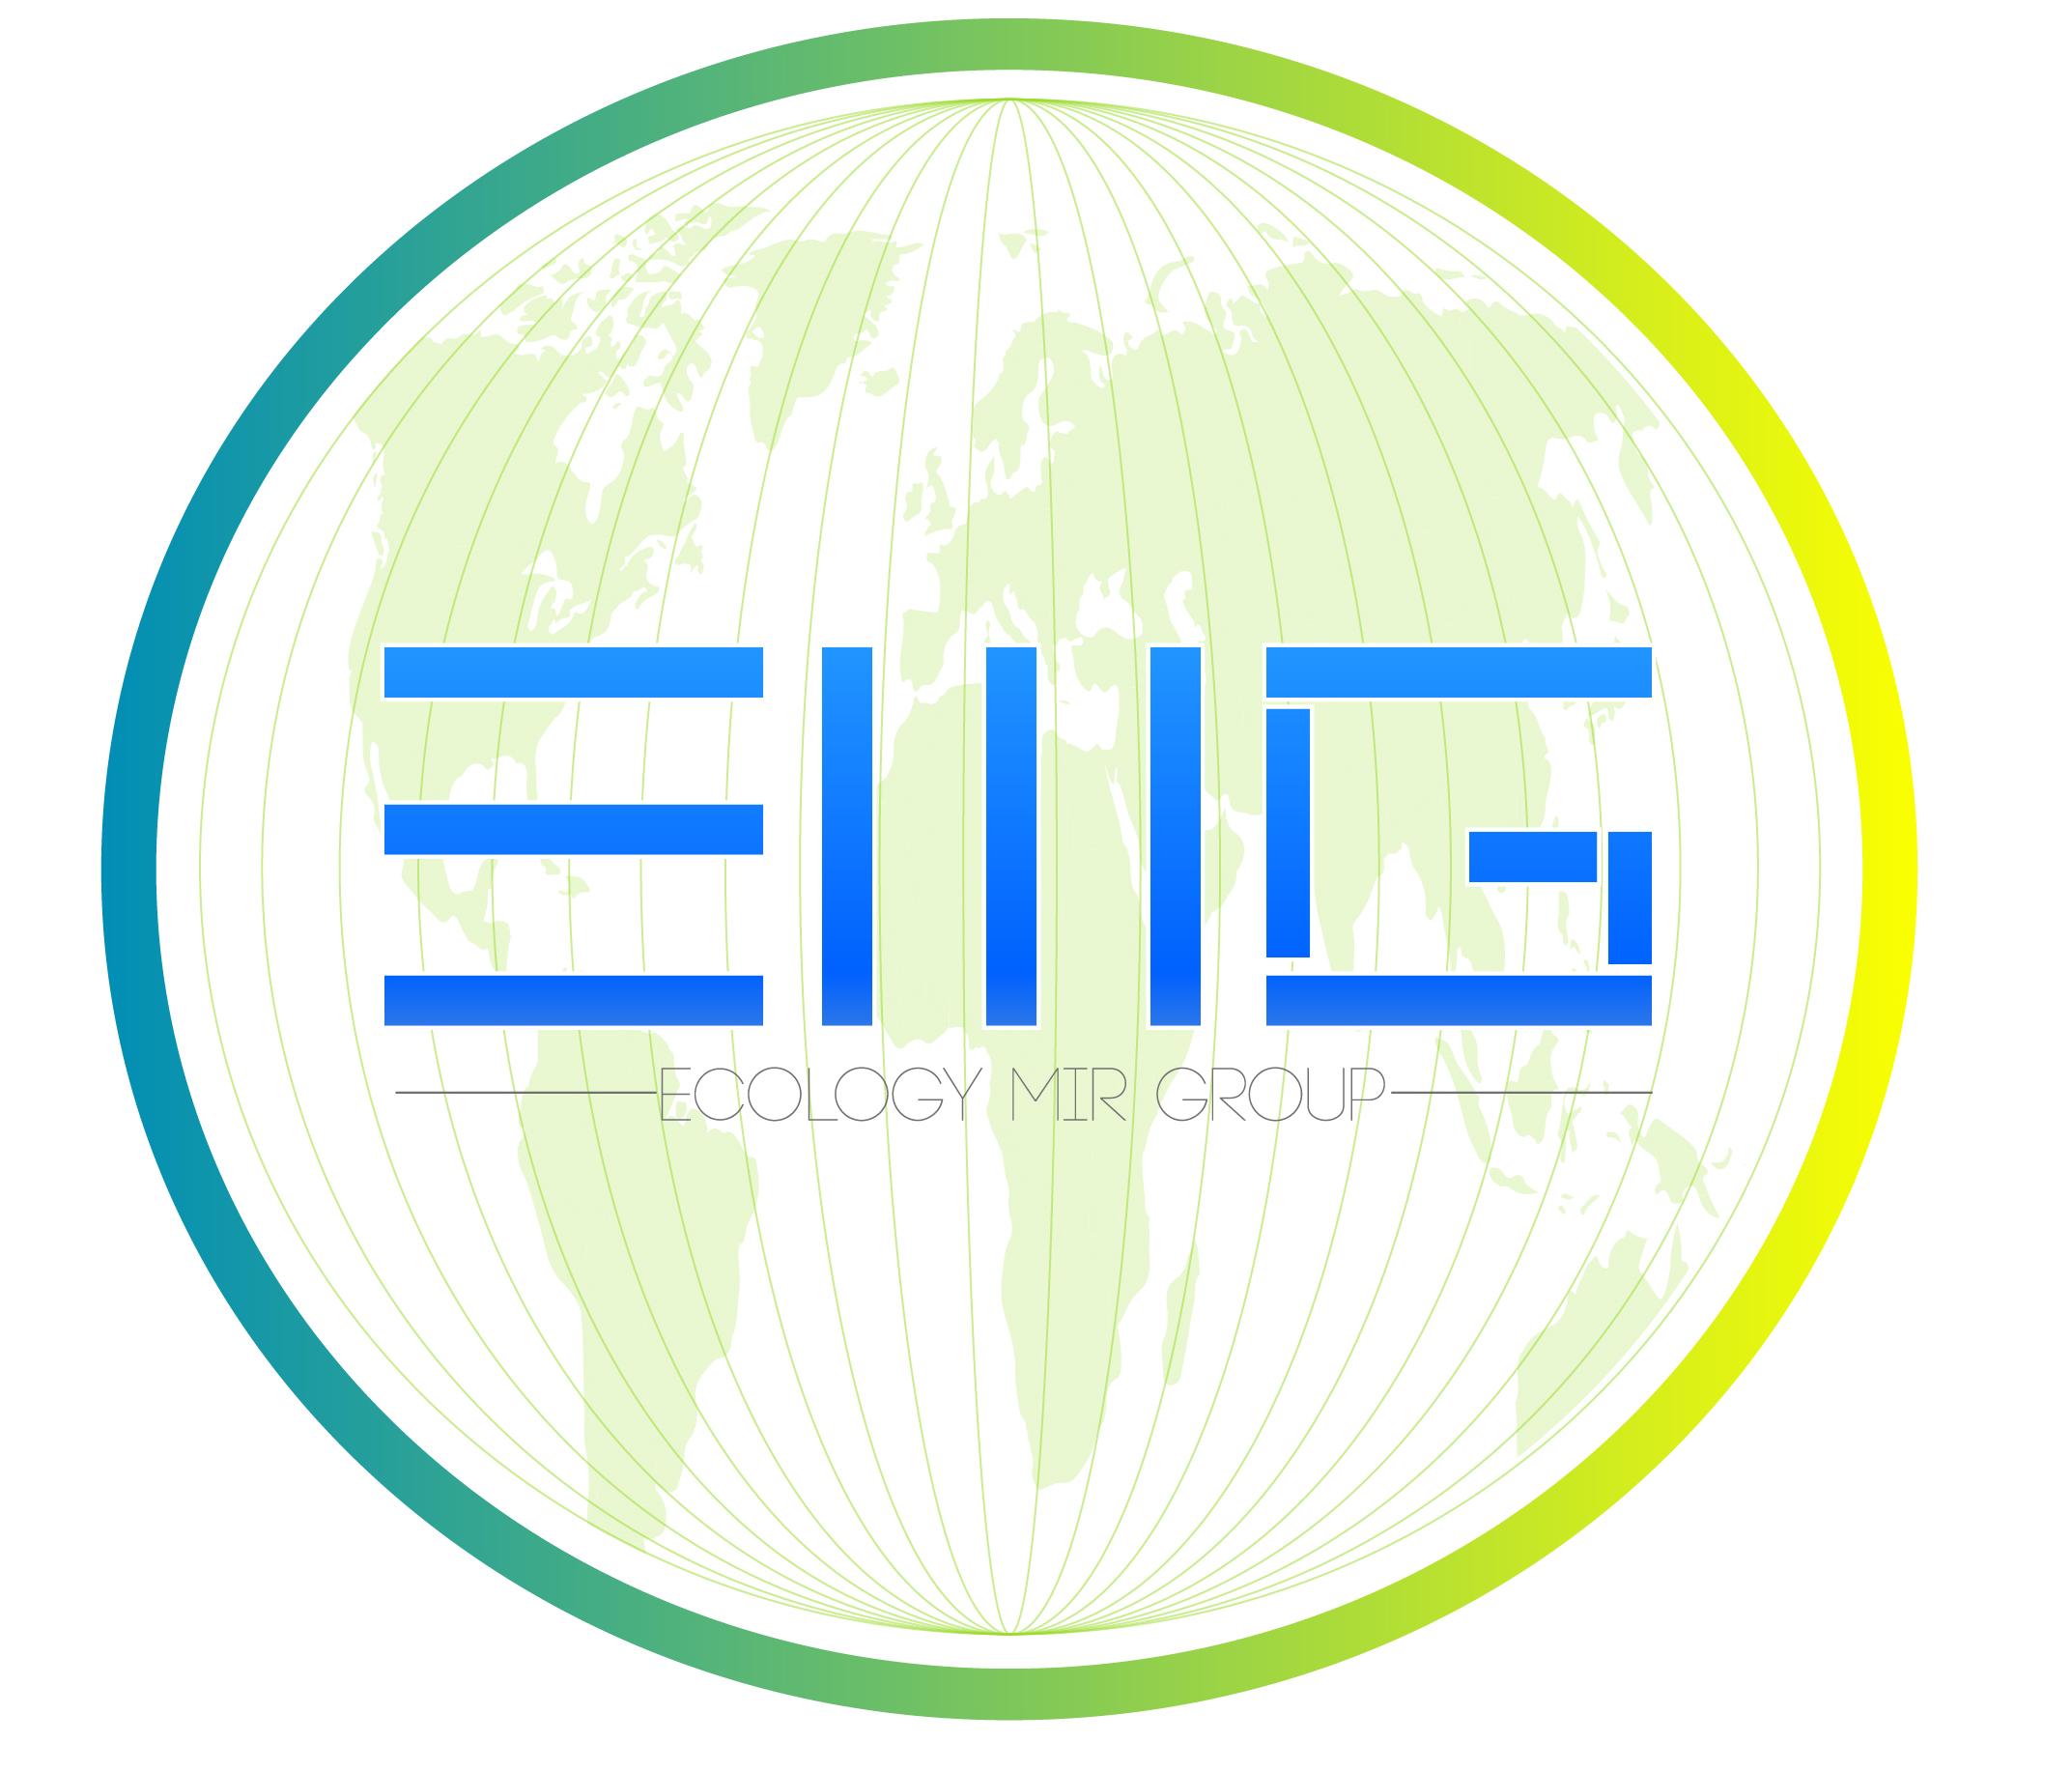 Ecology Mir Group